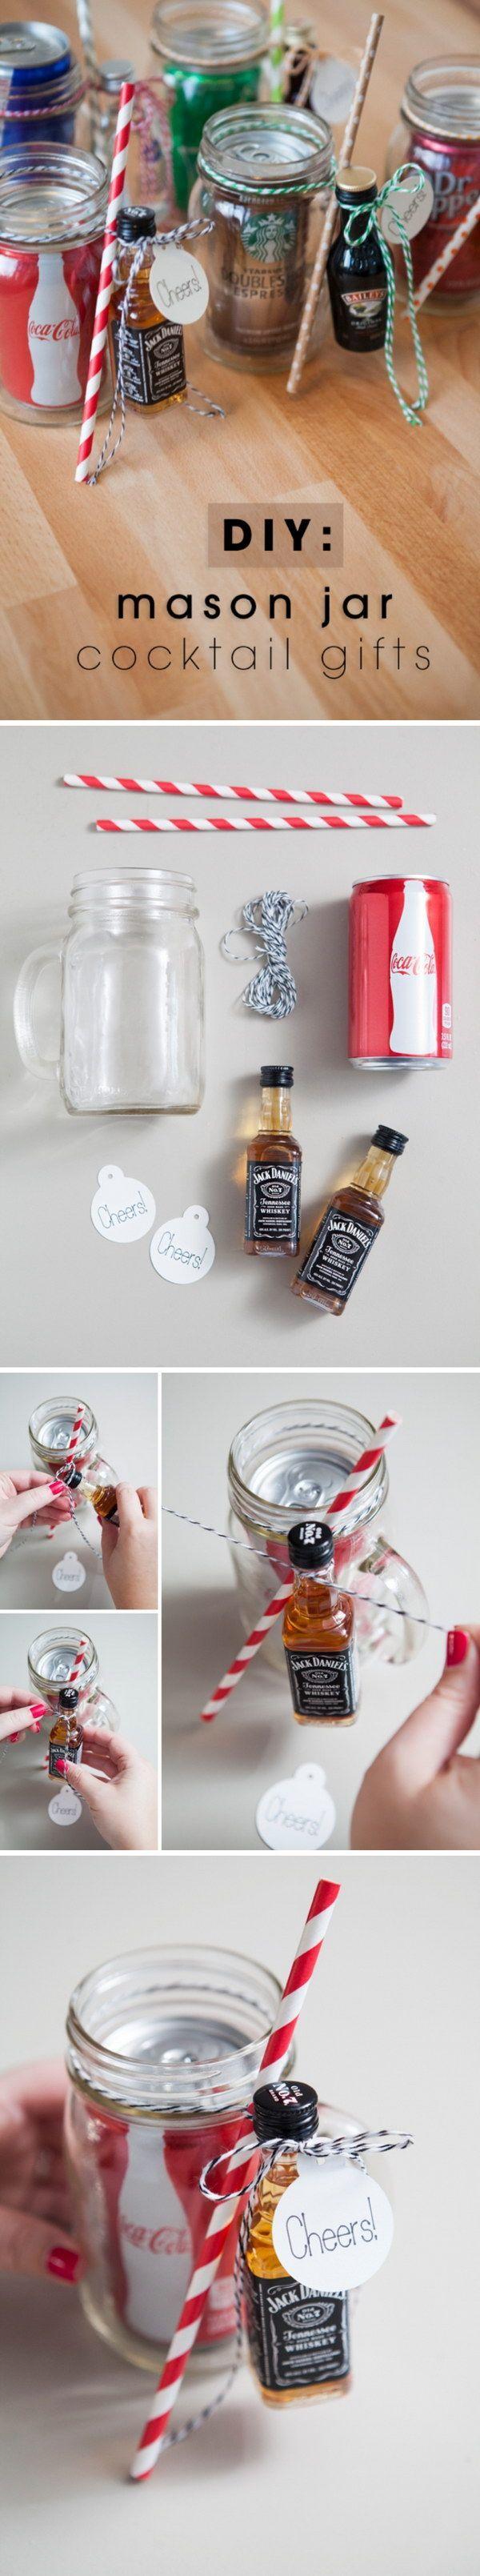 15 Easy Mason Jar Christmas Decorations You Can Make Yourself                                                                                                                                                                                 More